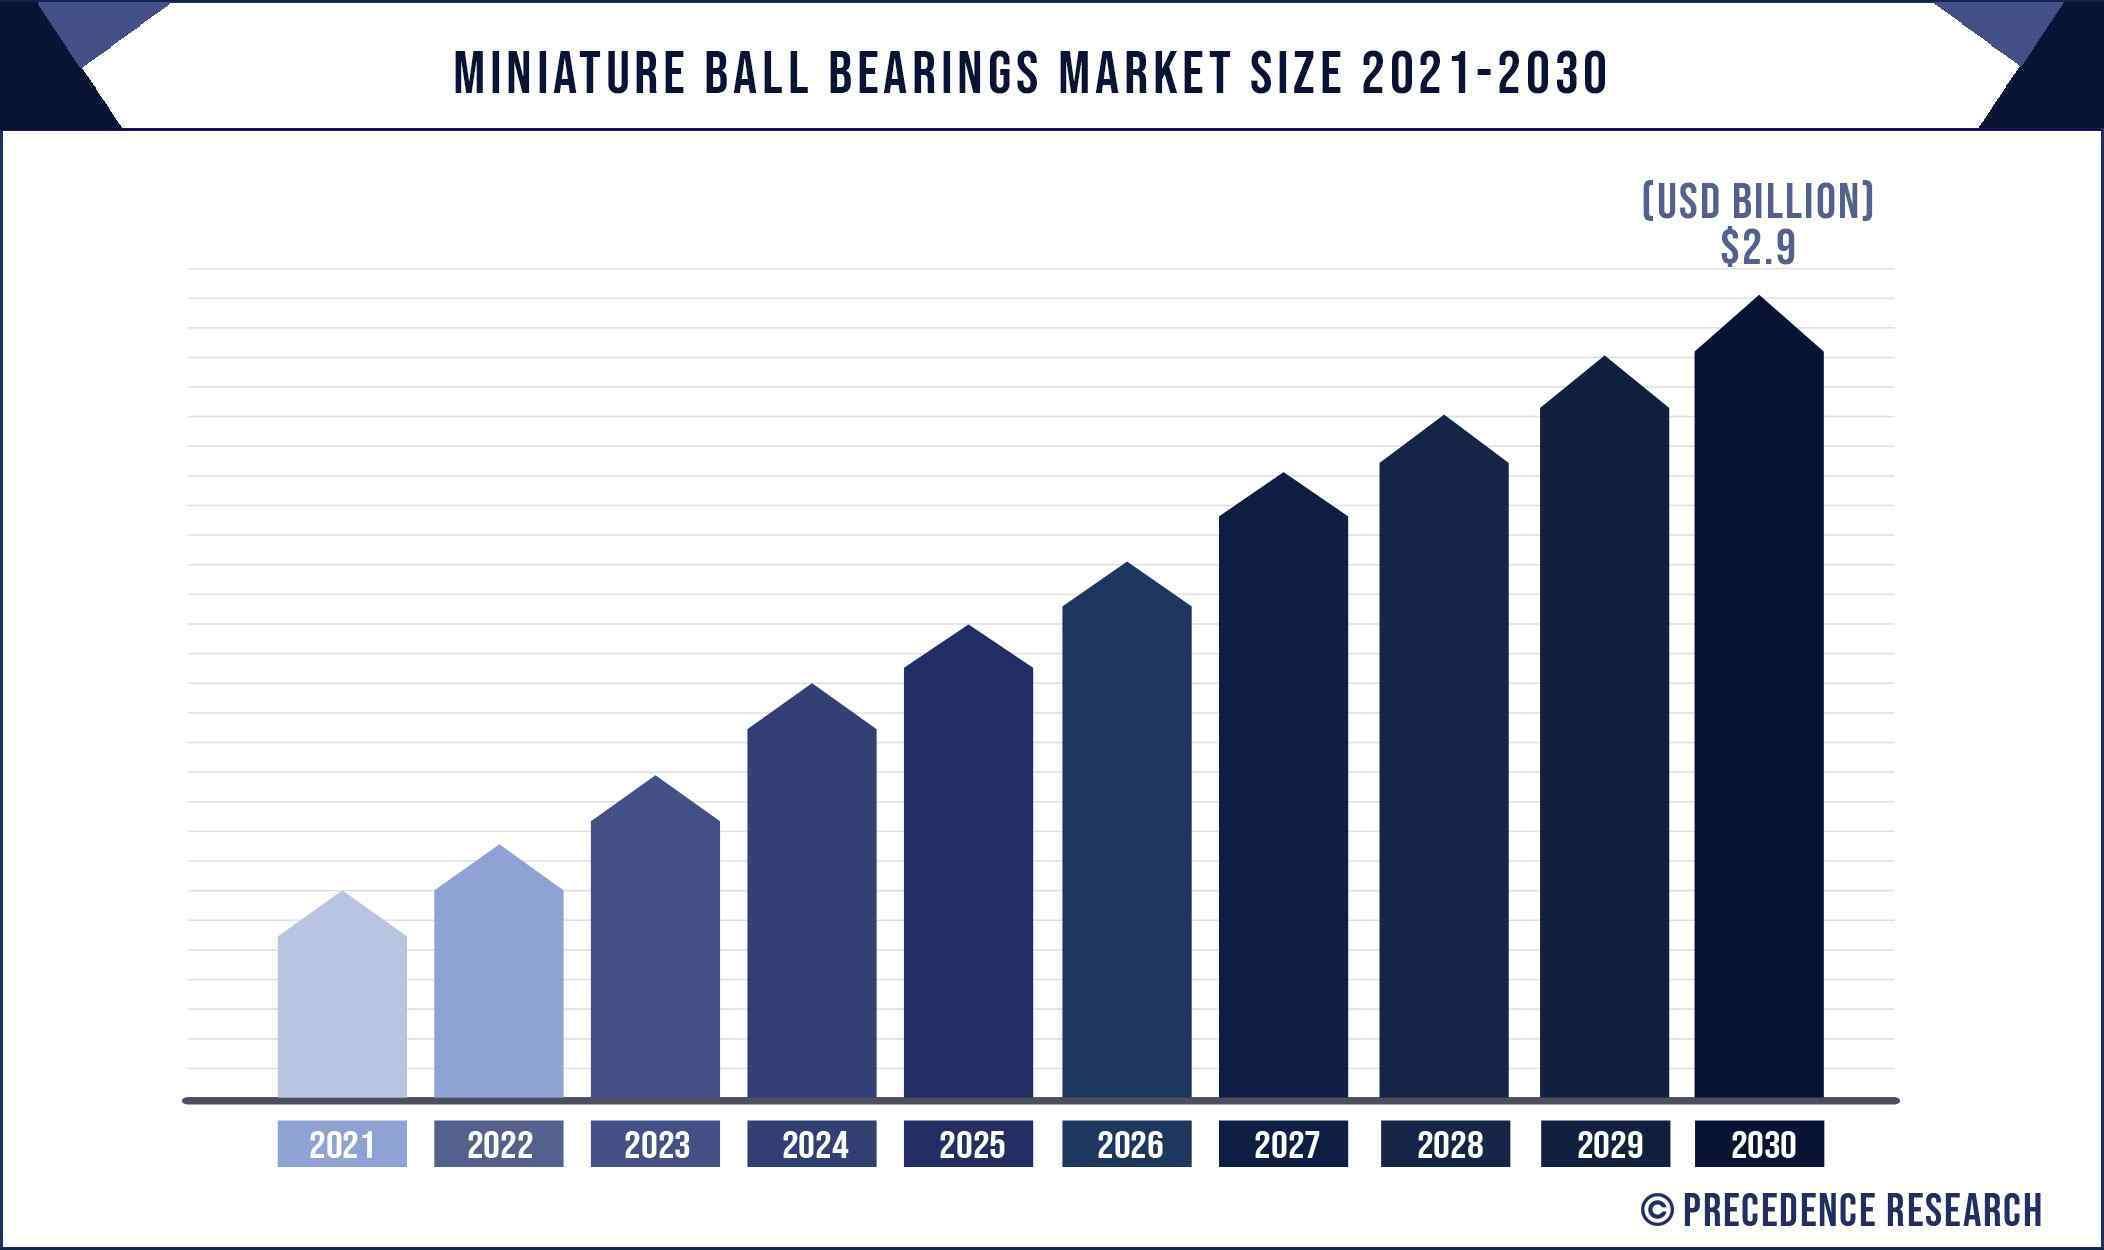 Miniature Ball Bearings Market Size 2021 to 2030